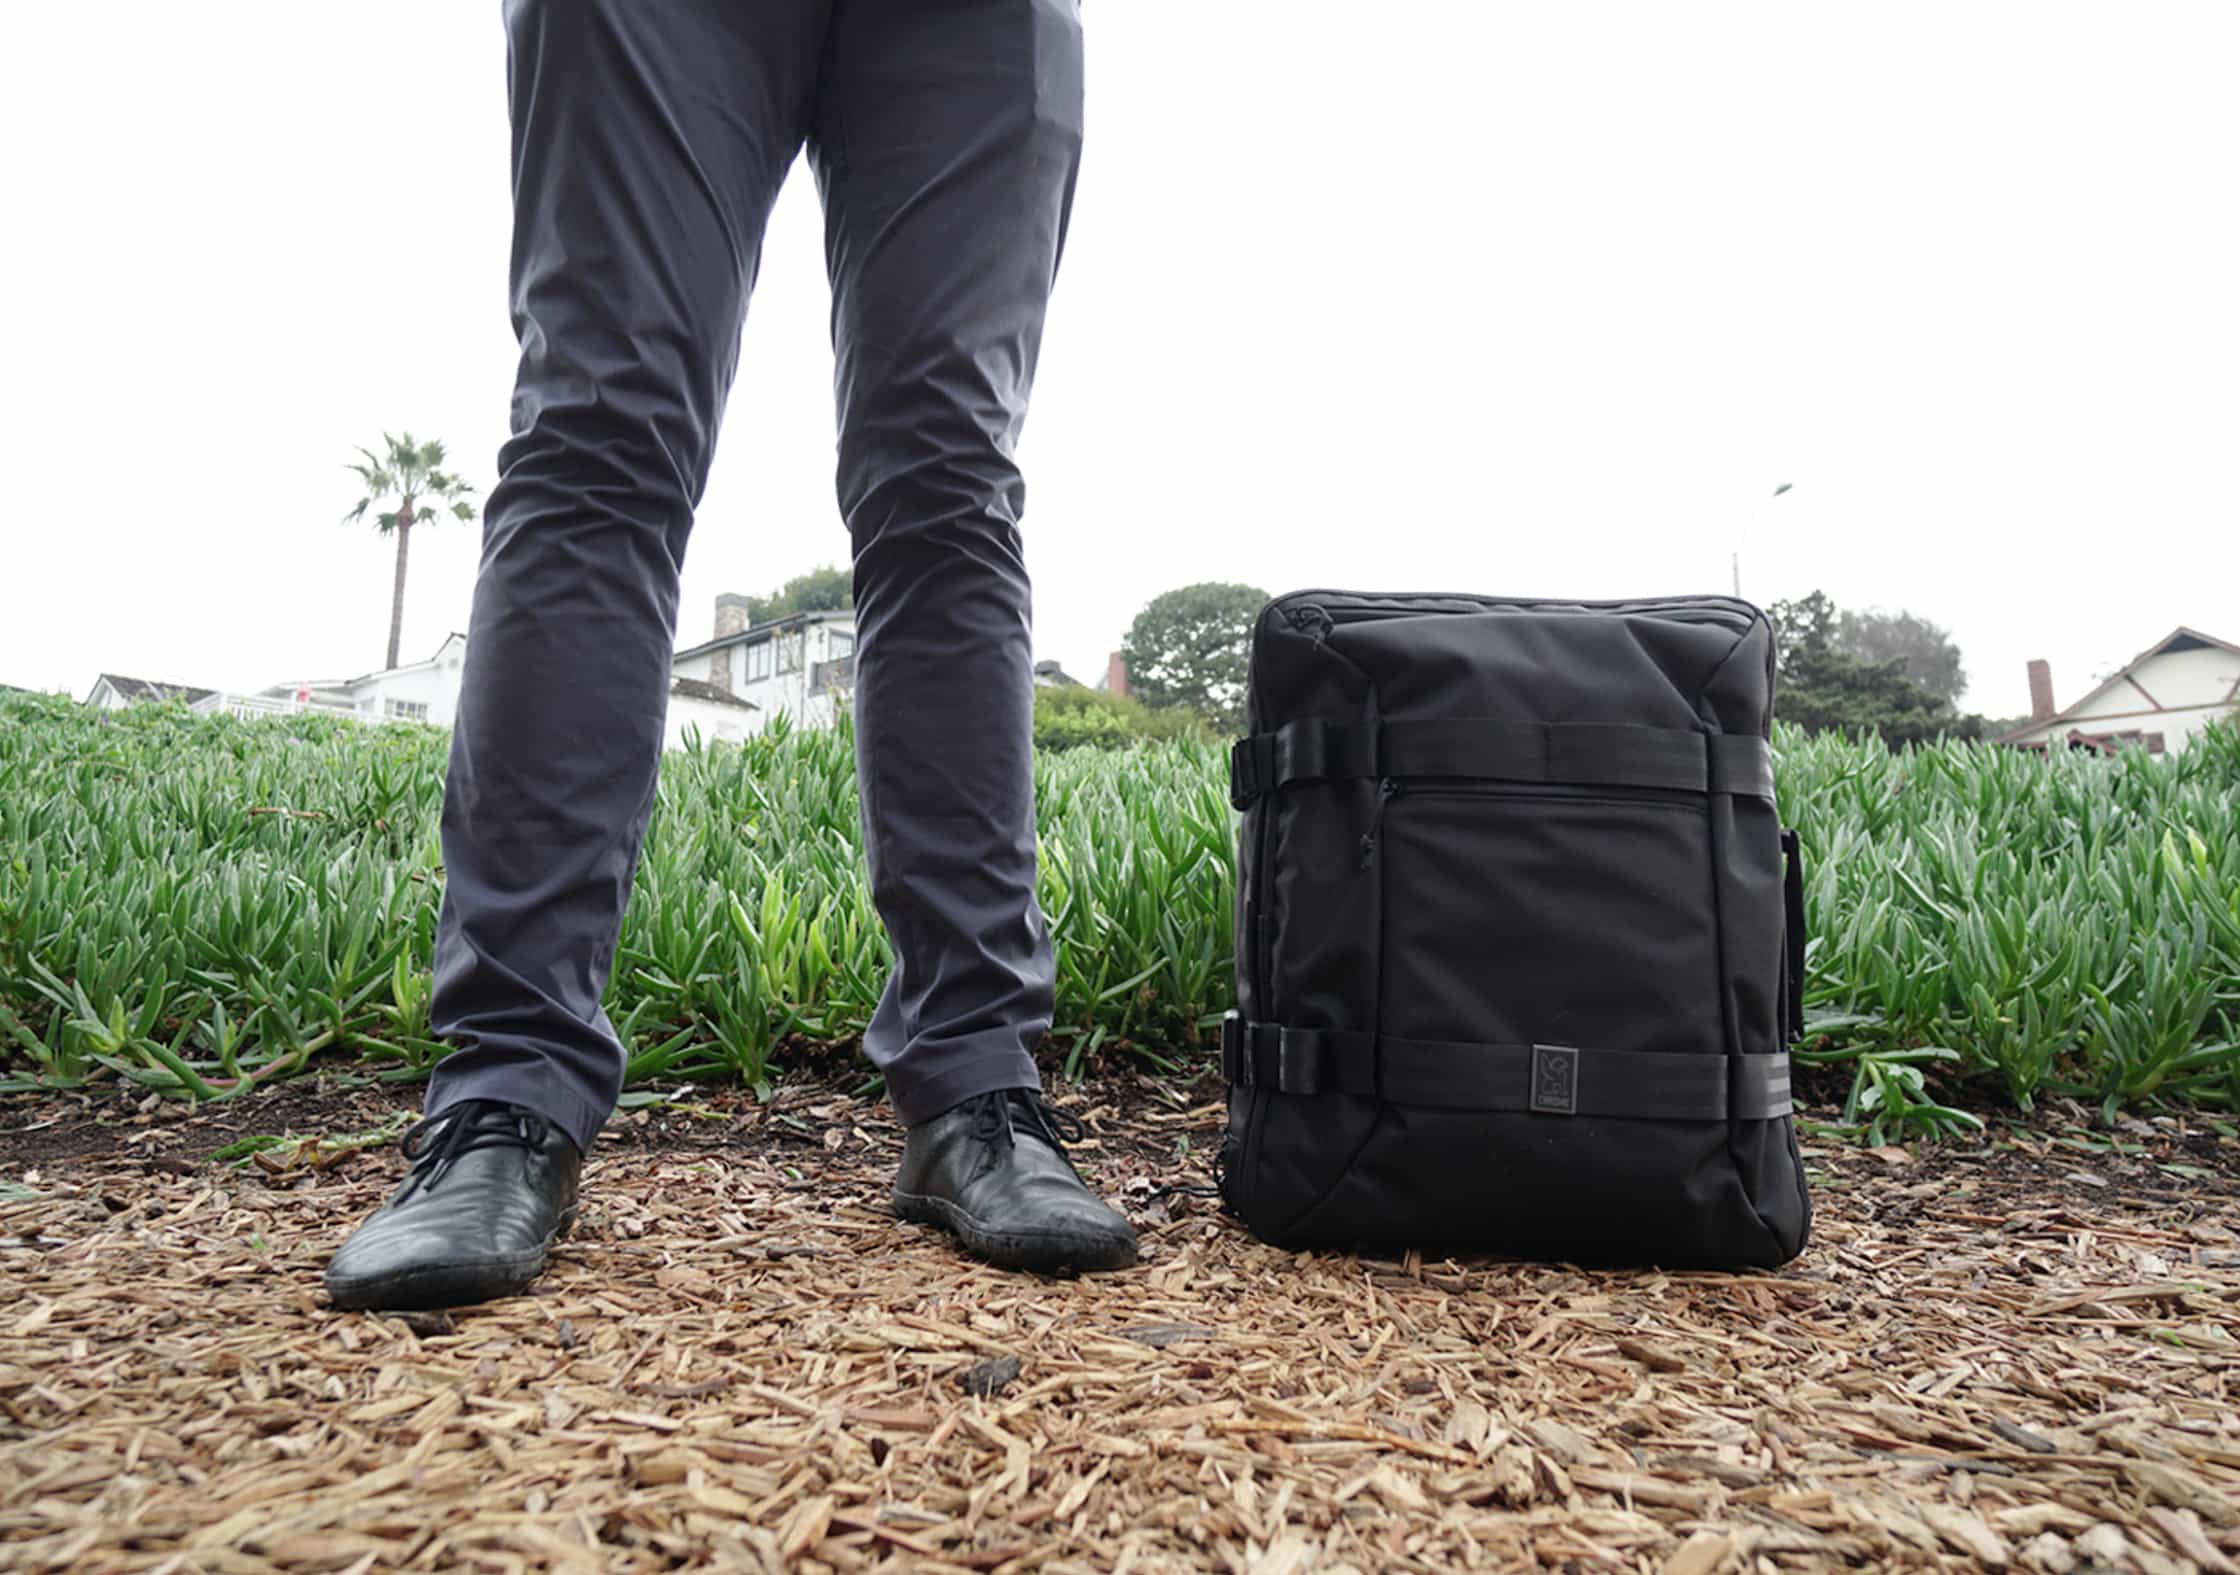 Chrome Macheto Travel Backpack Usage